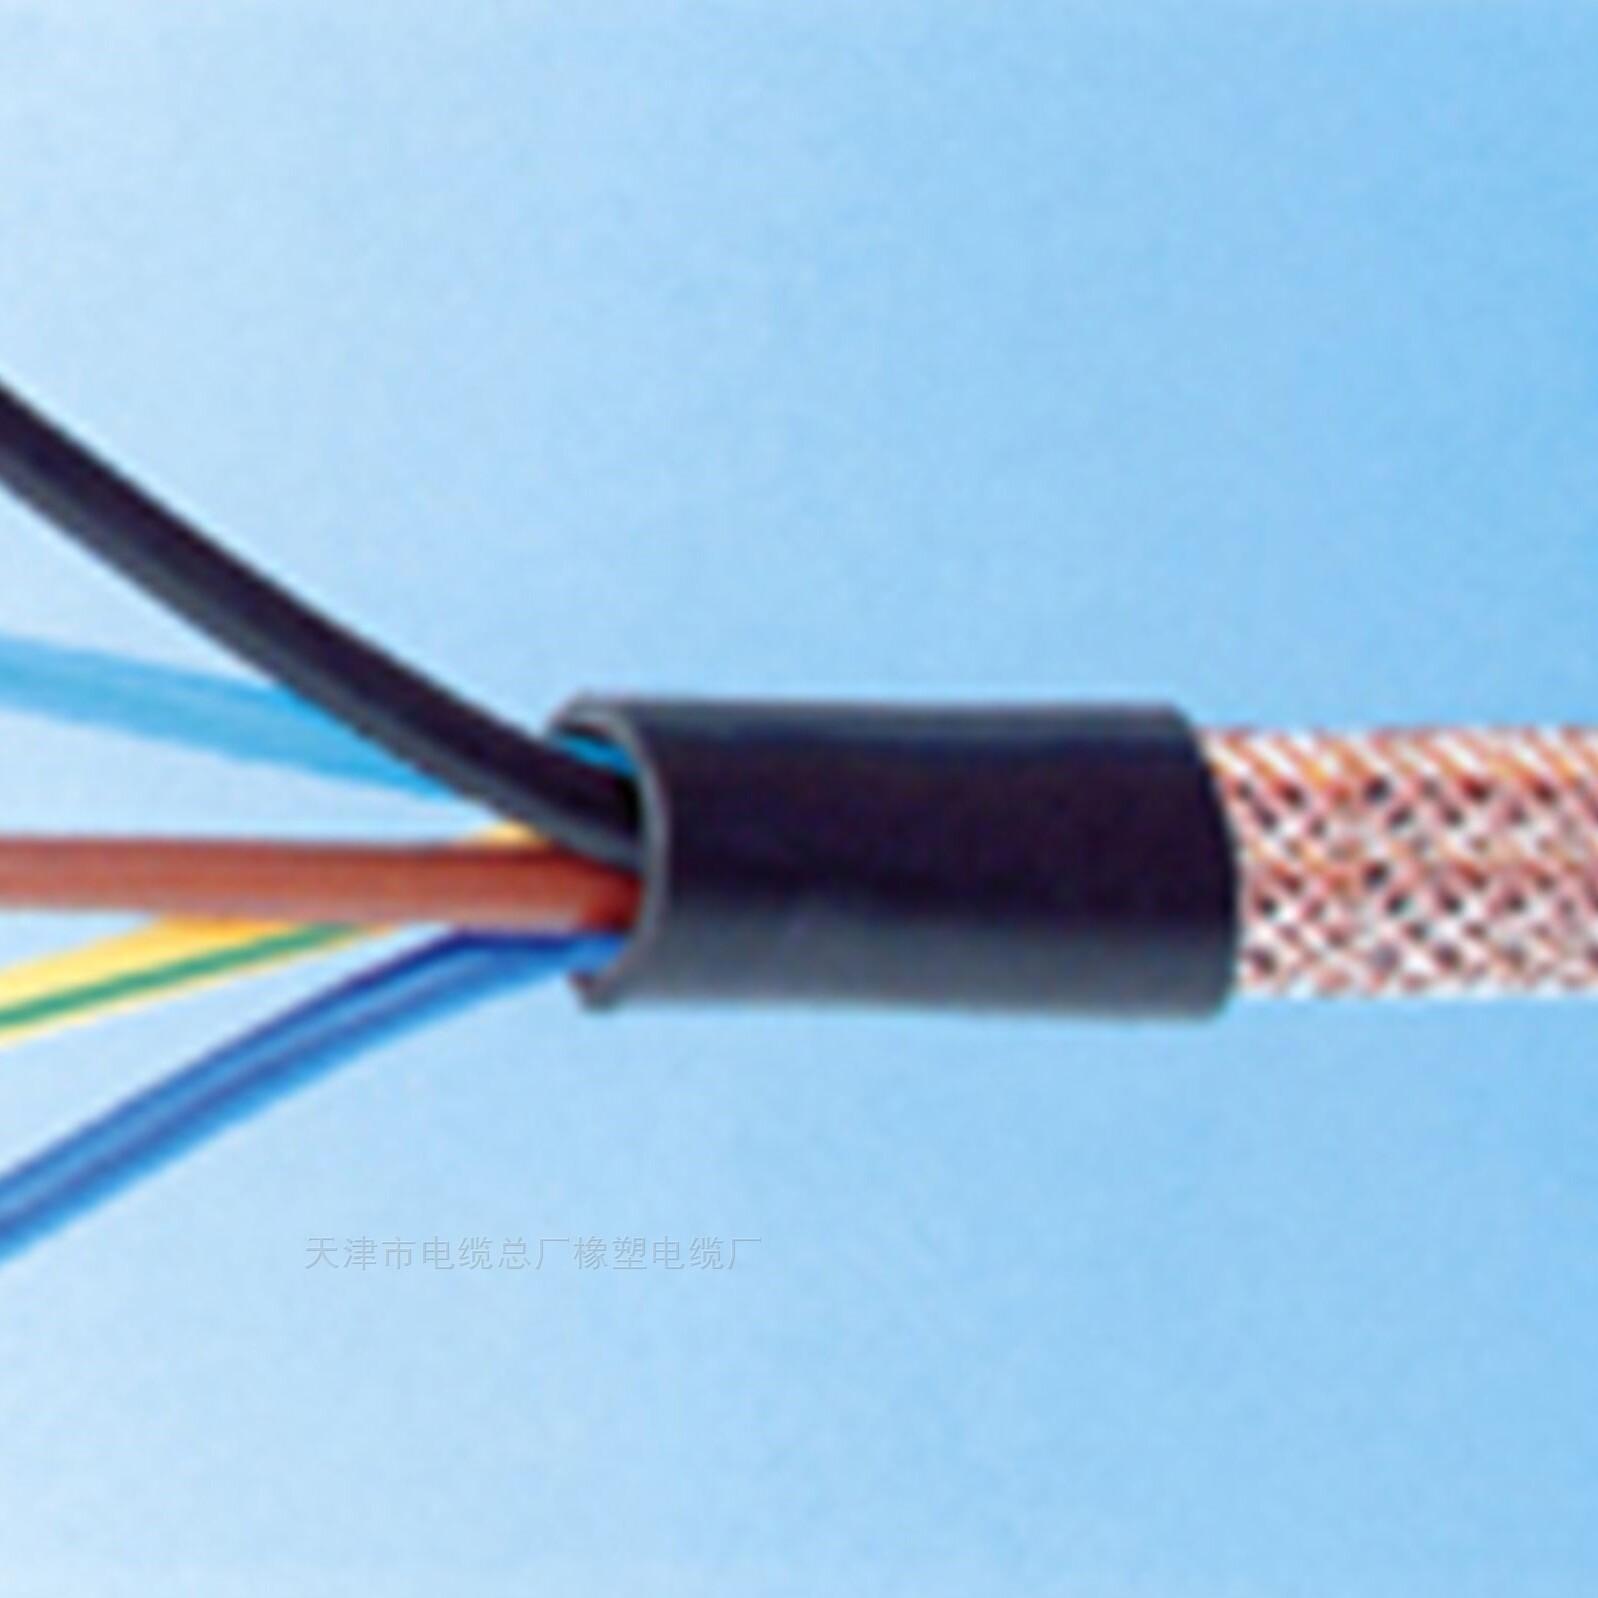 kvvp2-22控制电缆16*1.5产品图片